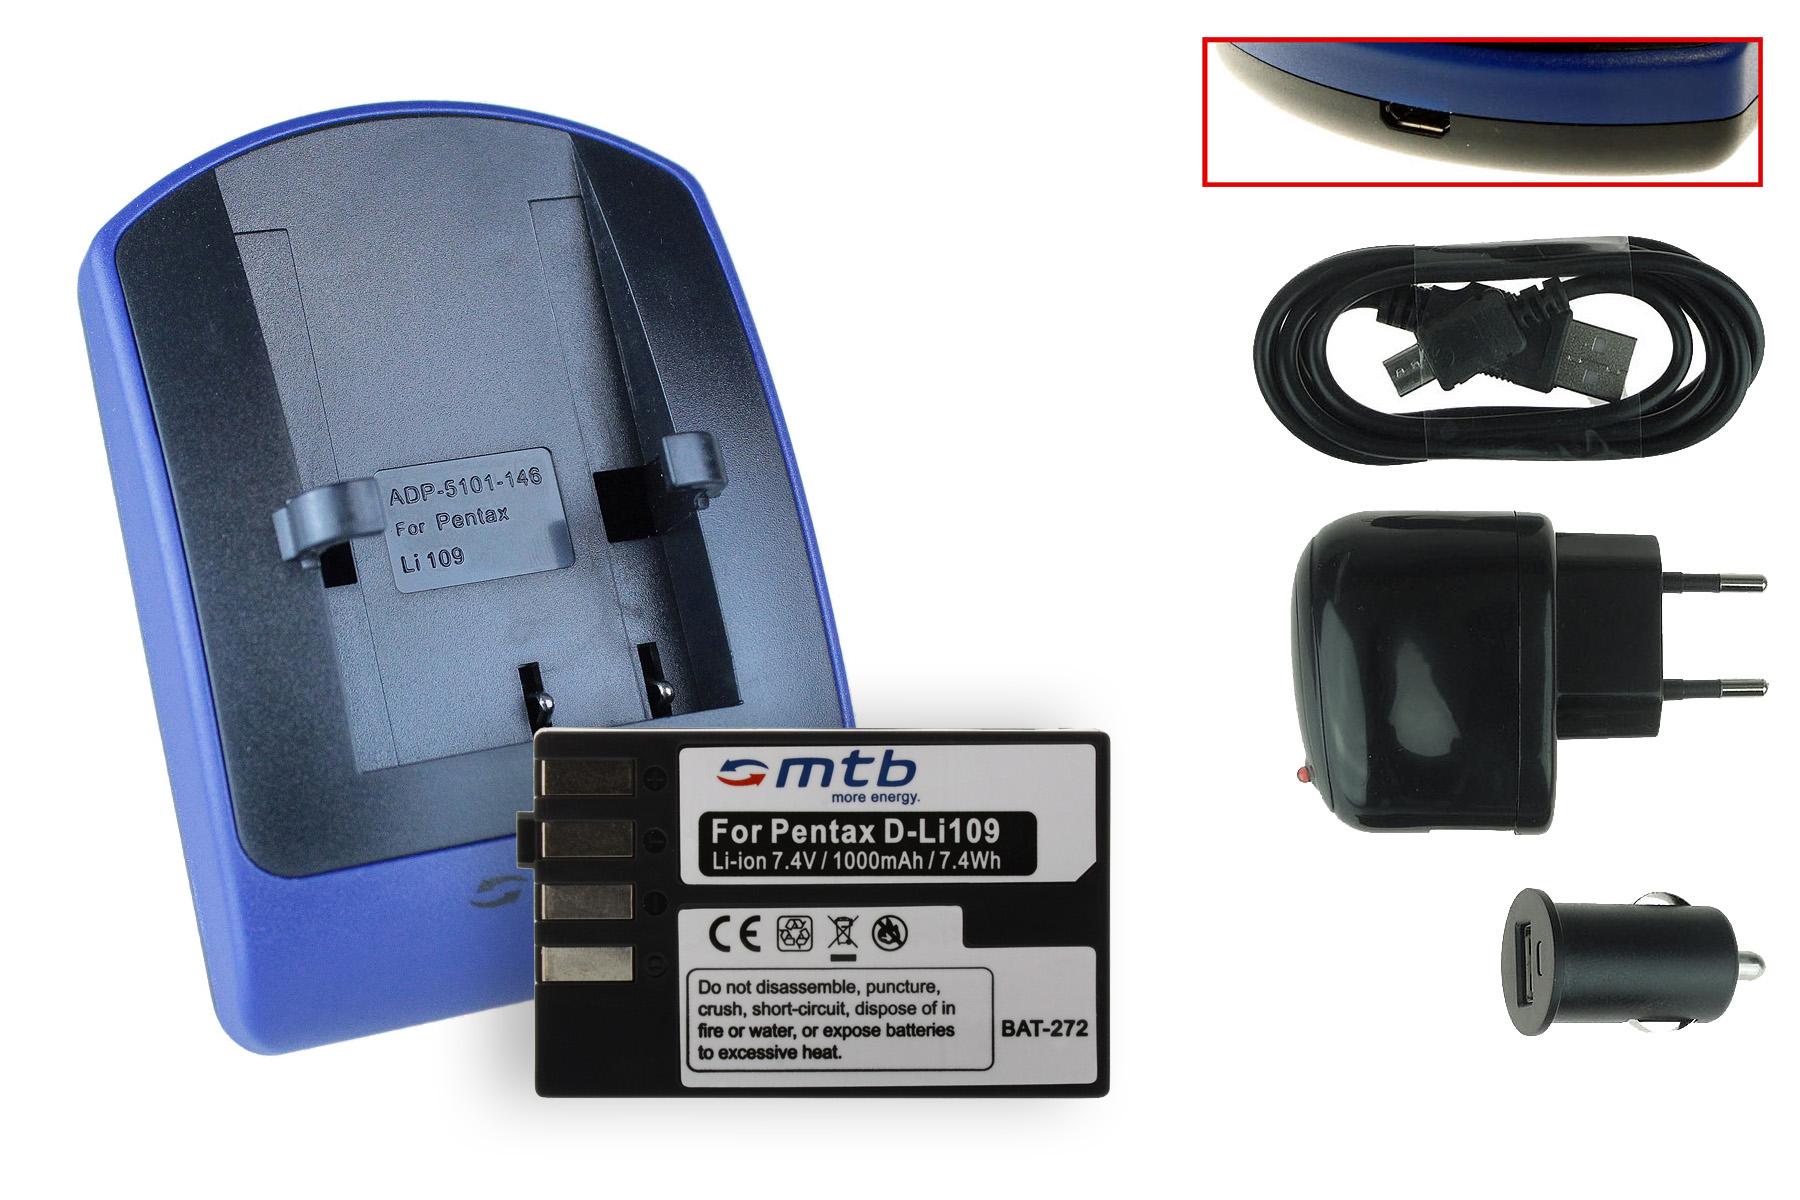 Ladegerät Set für Pentax ACCU K-30 K-50 K-70 K-500 K-R K-S1 K-S2 Ladestation